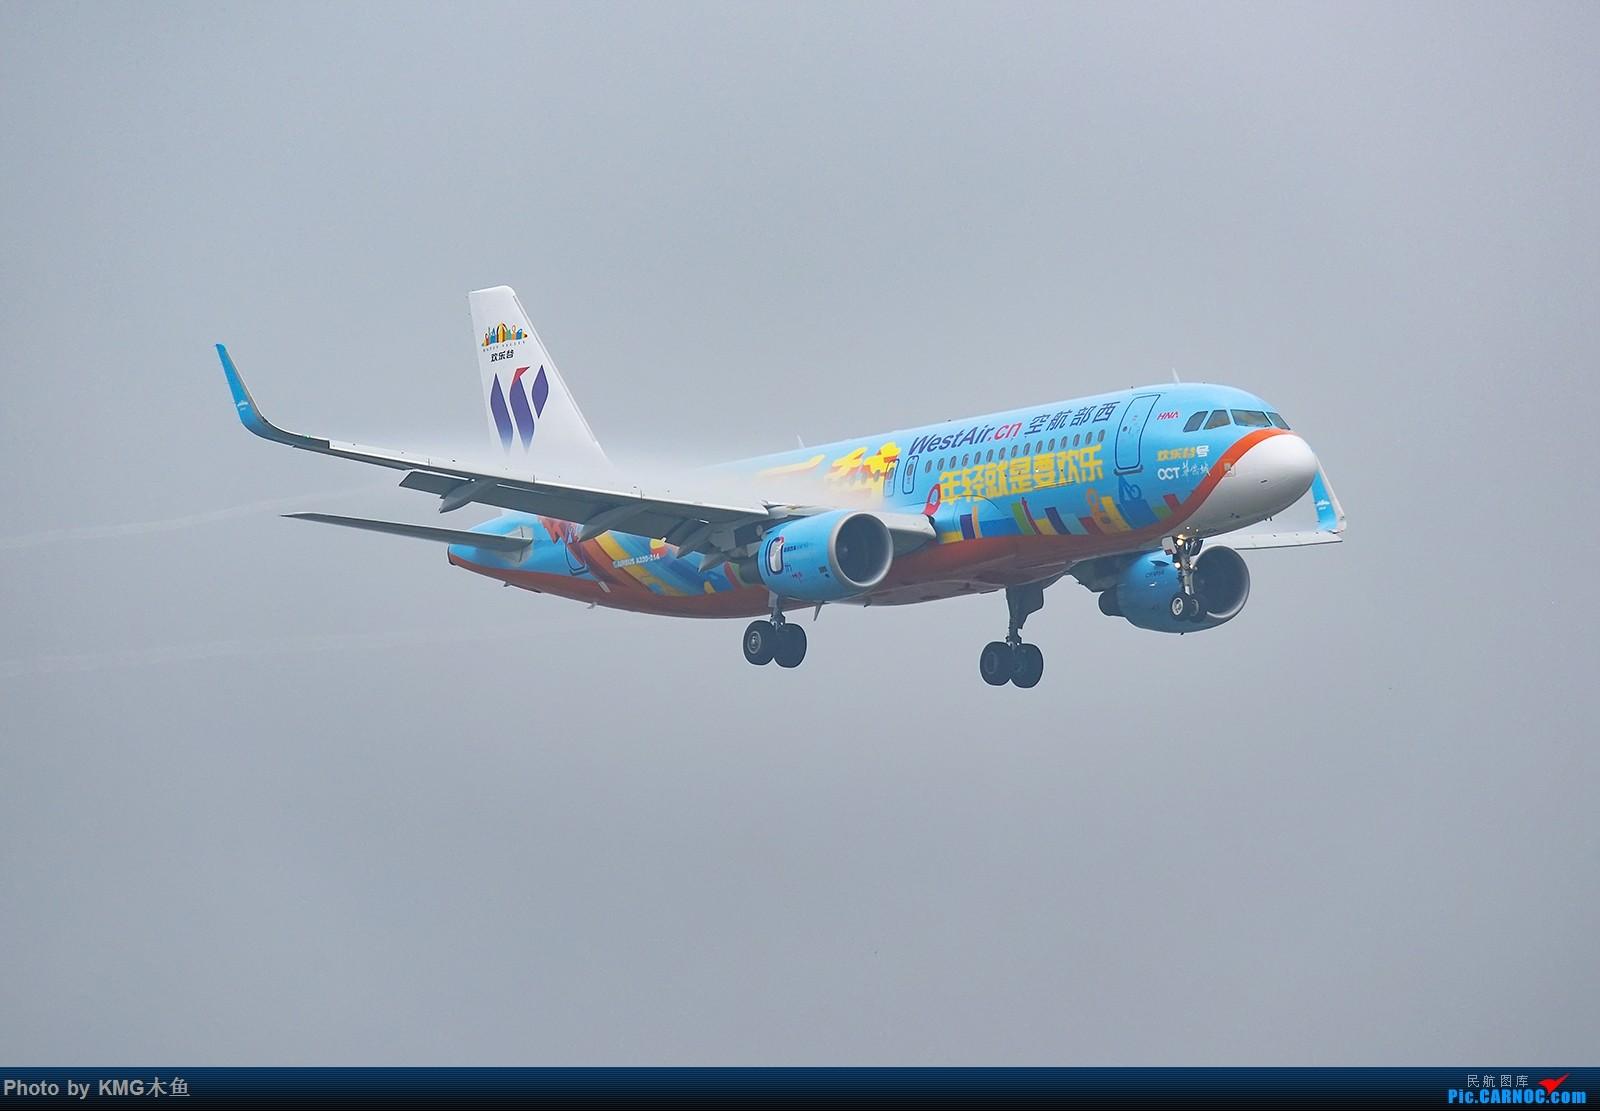 Re:[原创]【昆明长水国际机场——KMG木鱼拍机】昆明接二连三的阴雨天,形成了好货烂天有,烂天必有好货的奇特现象 AIRBUS A320-200 B-9982 中国昆明长水国际机场